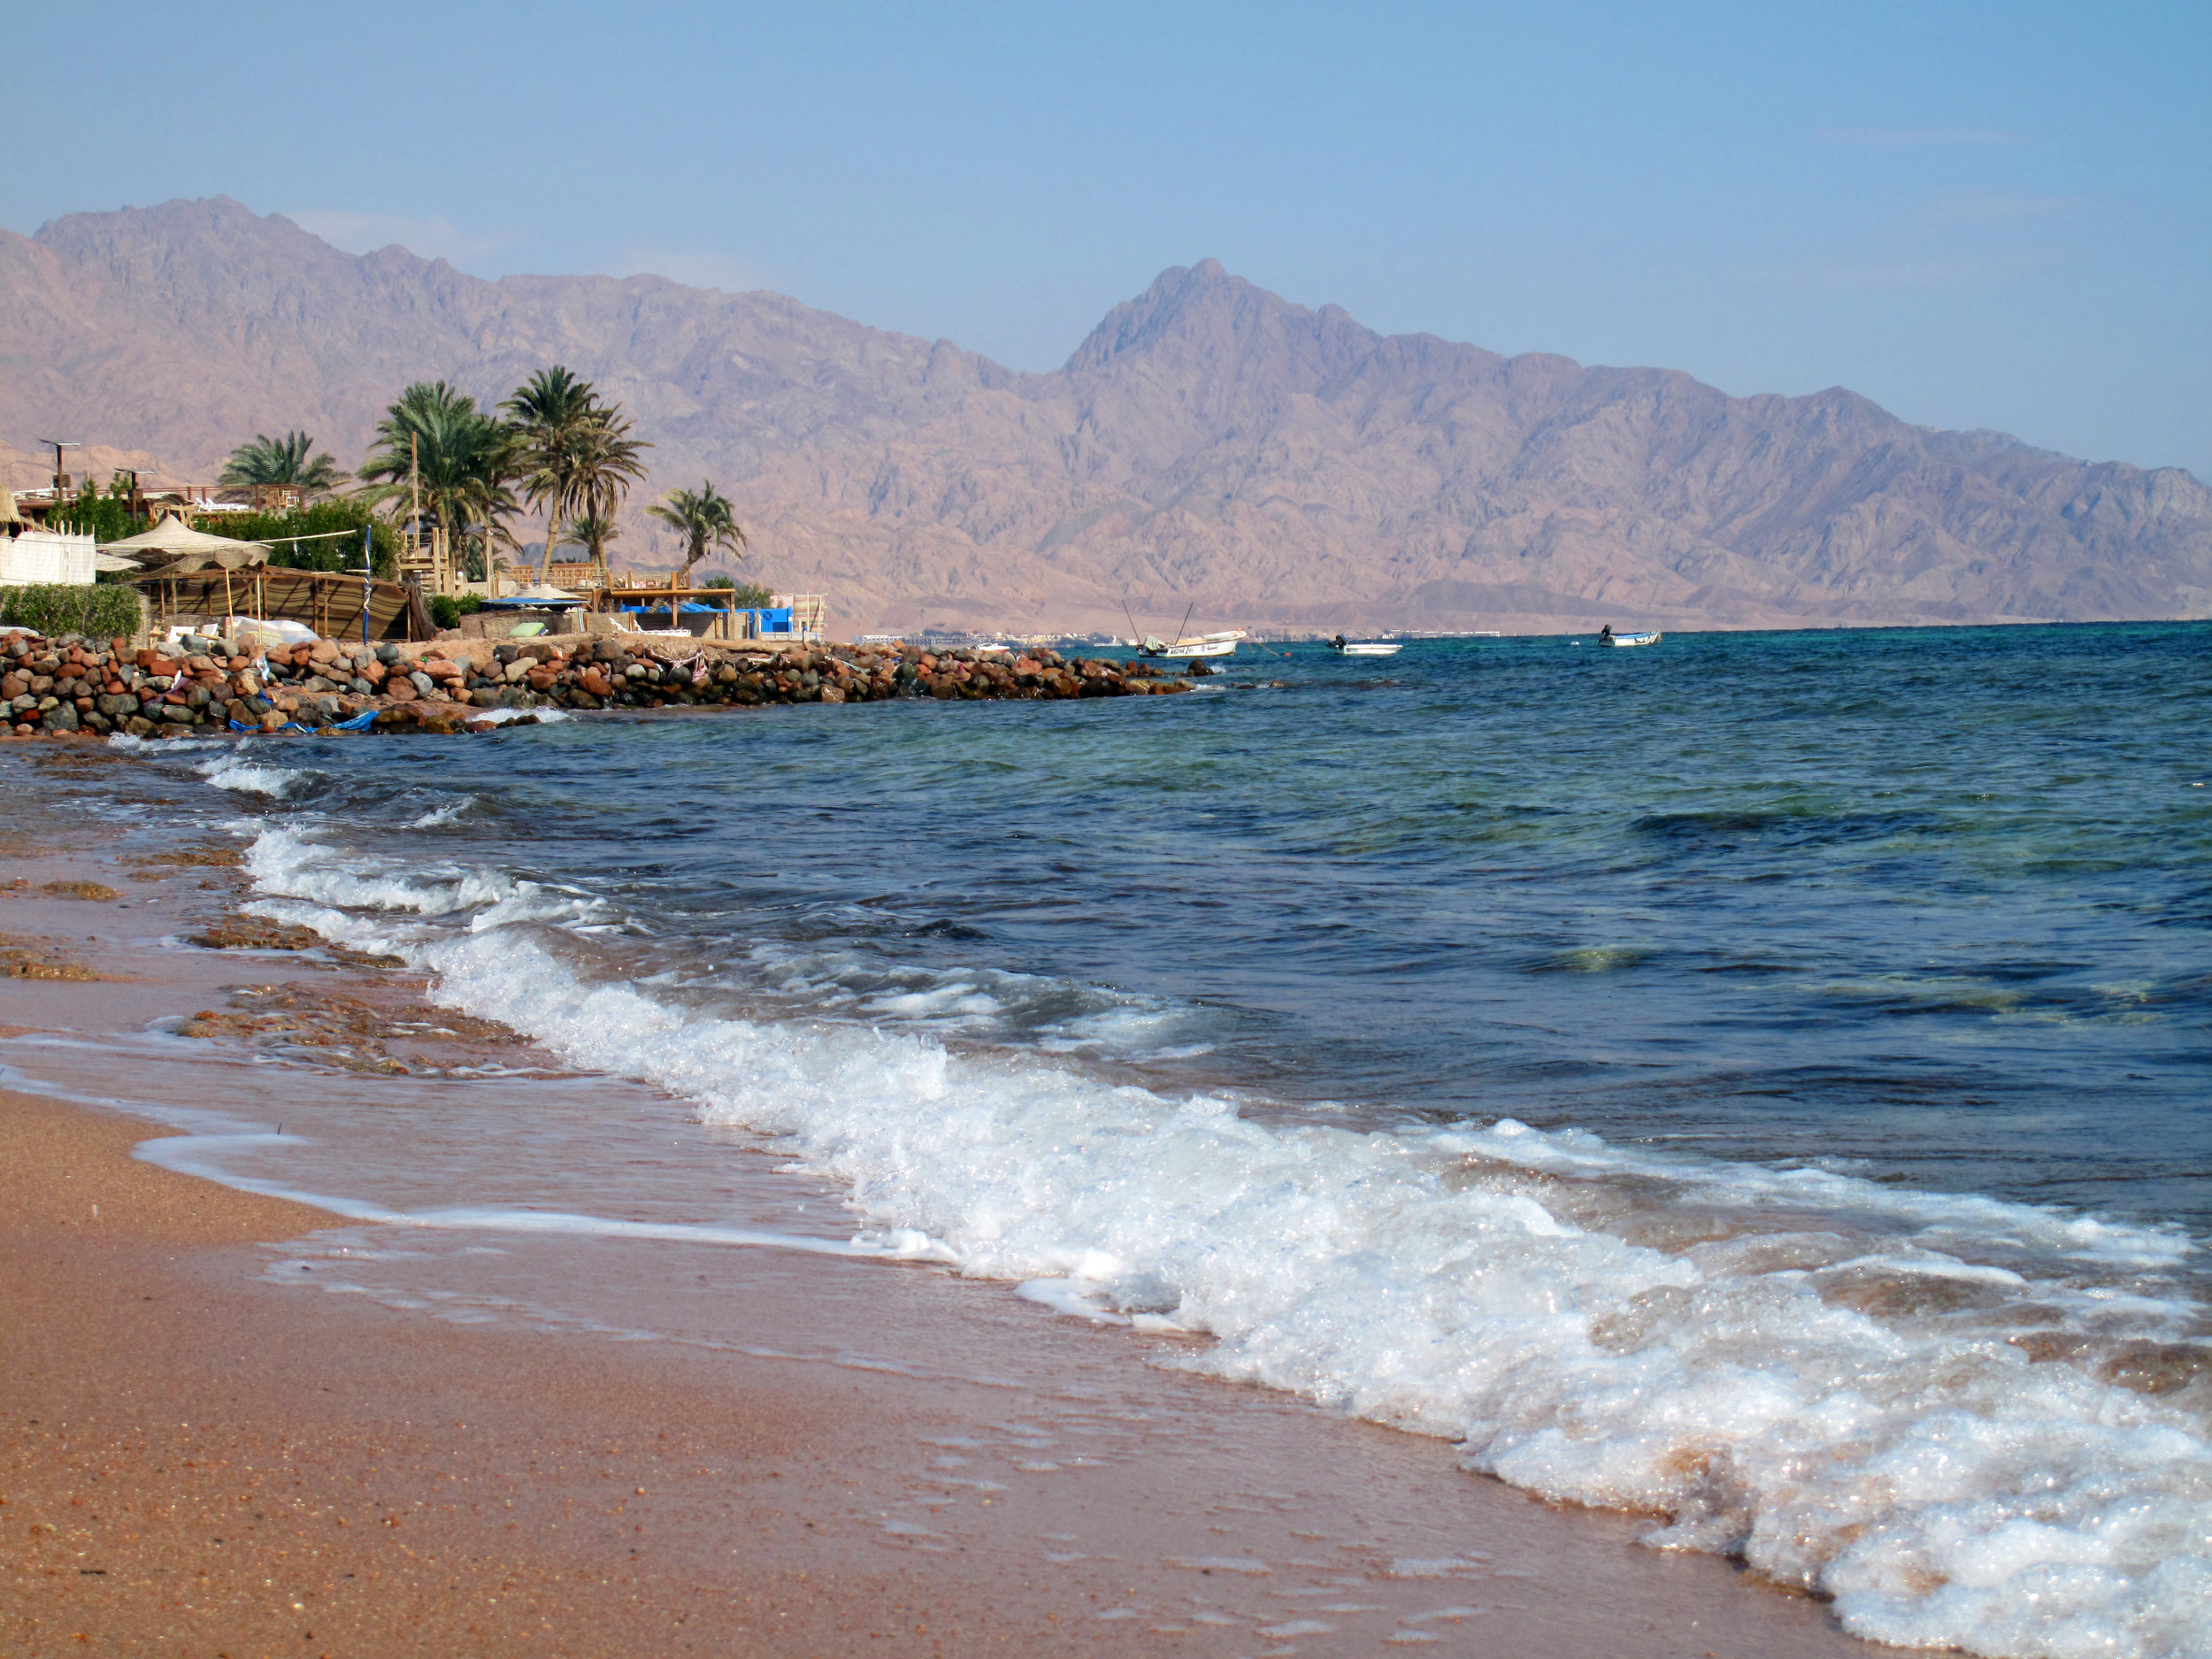 Dahab_Coachhouse_Egypt_Sinai_Red_Sea_Masbat_Bay-Eel_Garden.JPG